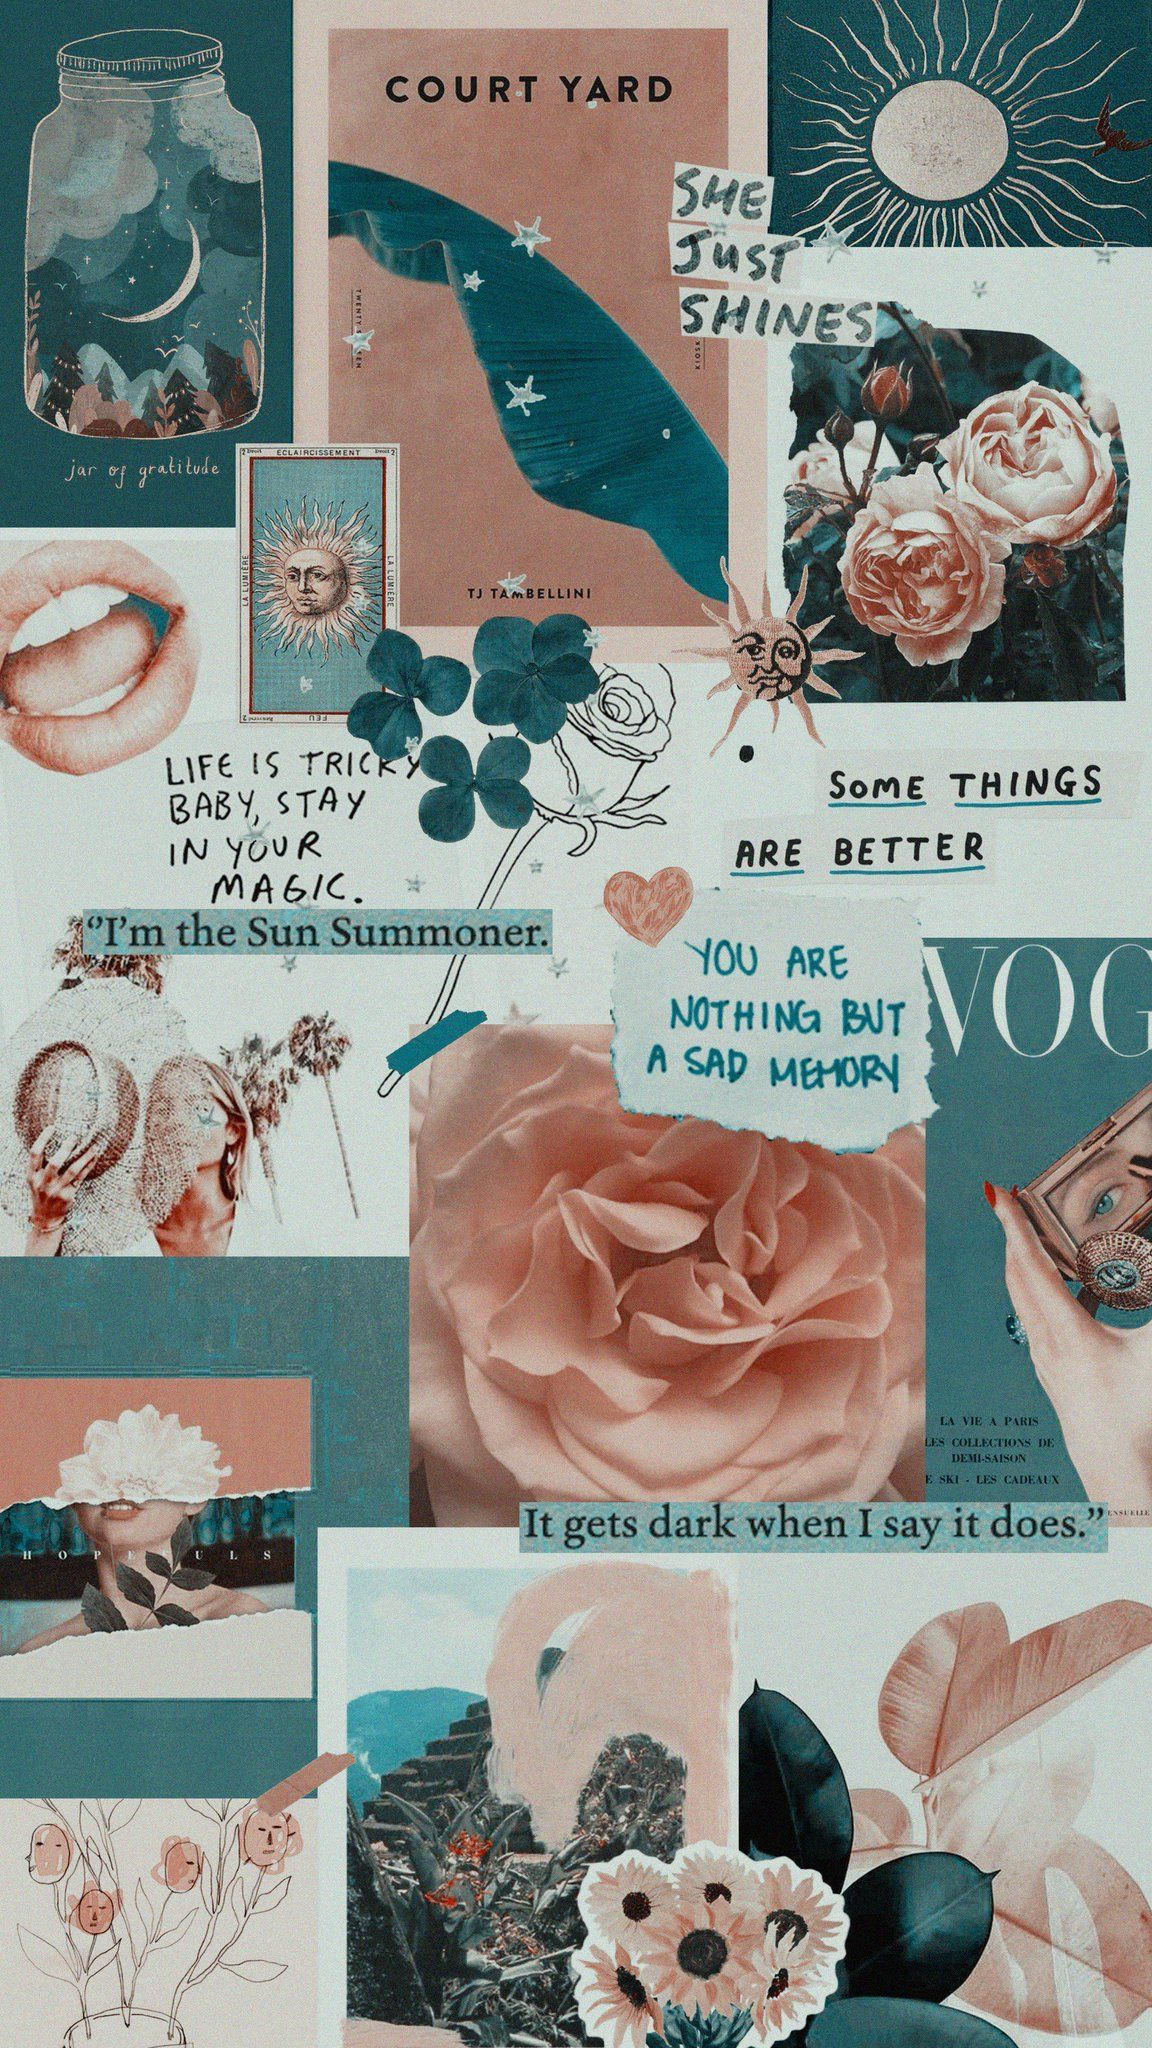 ✔ Aesthetic Vintage Retro Wallpaper #aesthetic #aestheticallypleasing #chillvibes